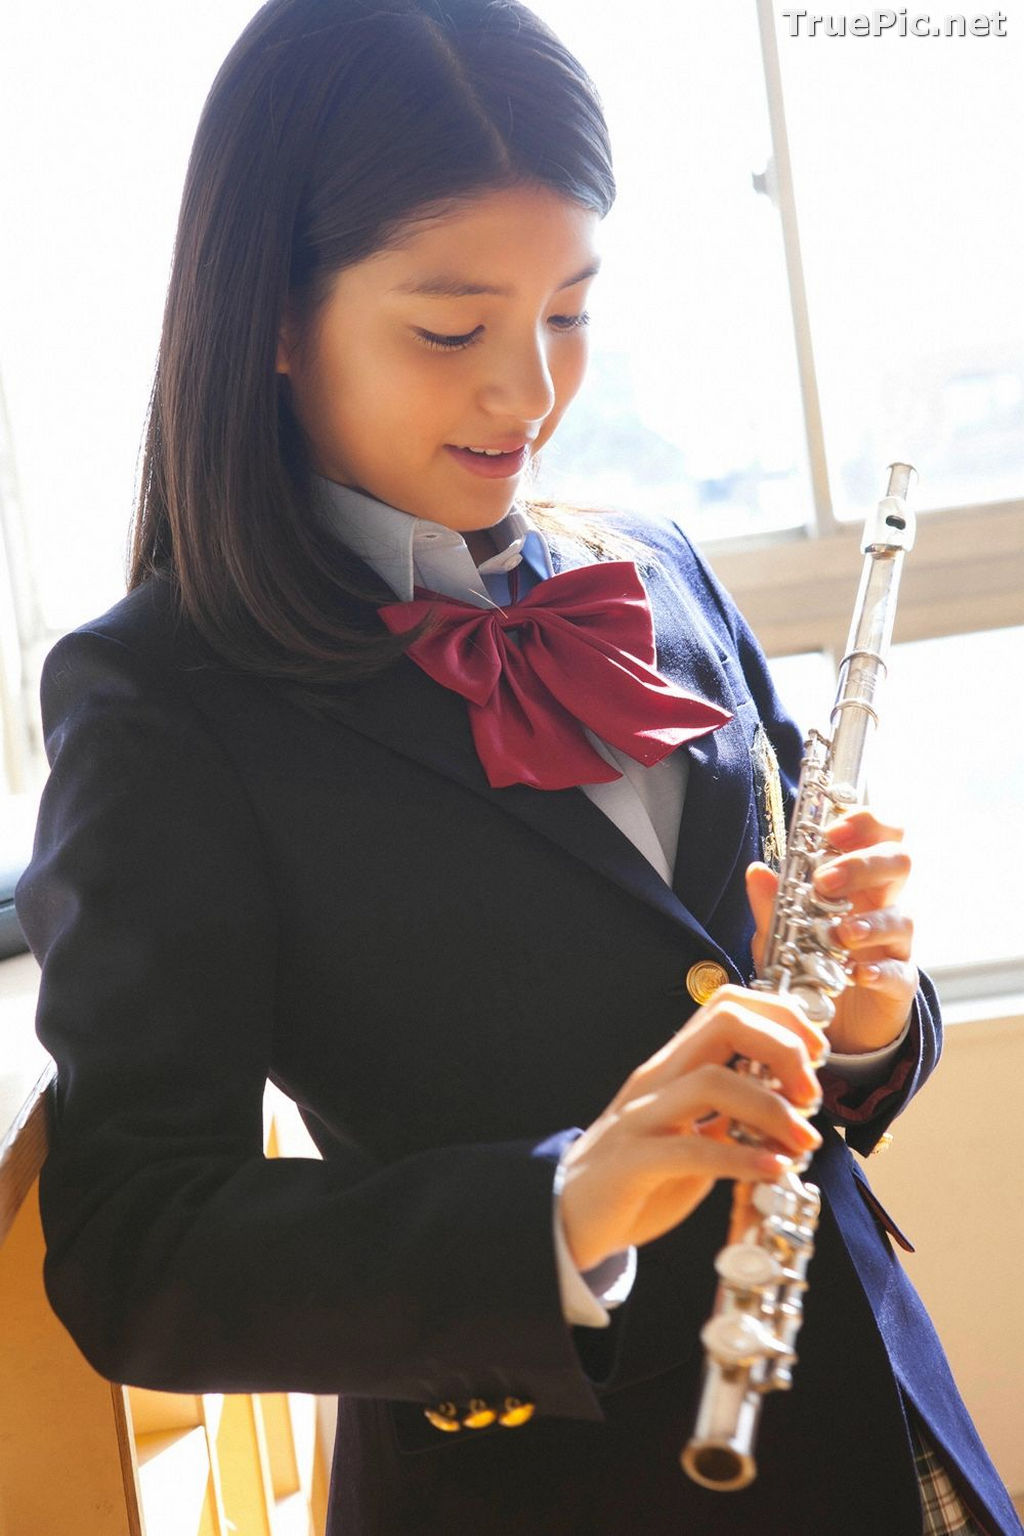 Image [YS Web] Vol.506 - Japanese Actress and Singer - Umika Kawashima - TruePic.net - Picture-4